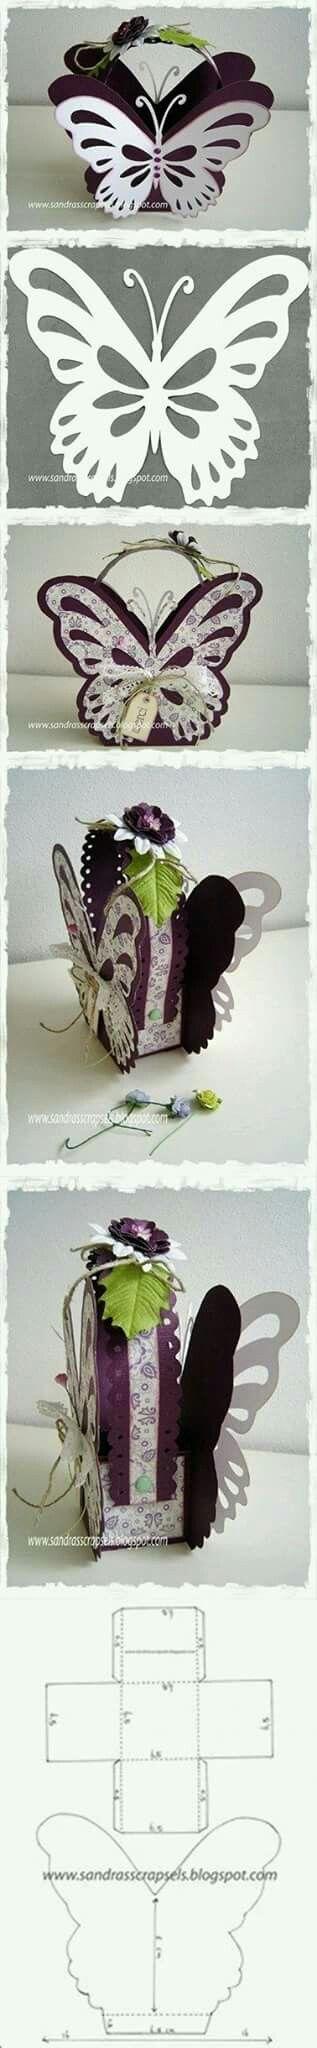 Cajita de mariposa